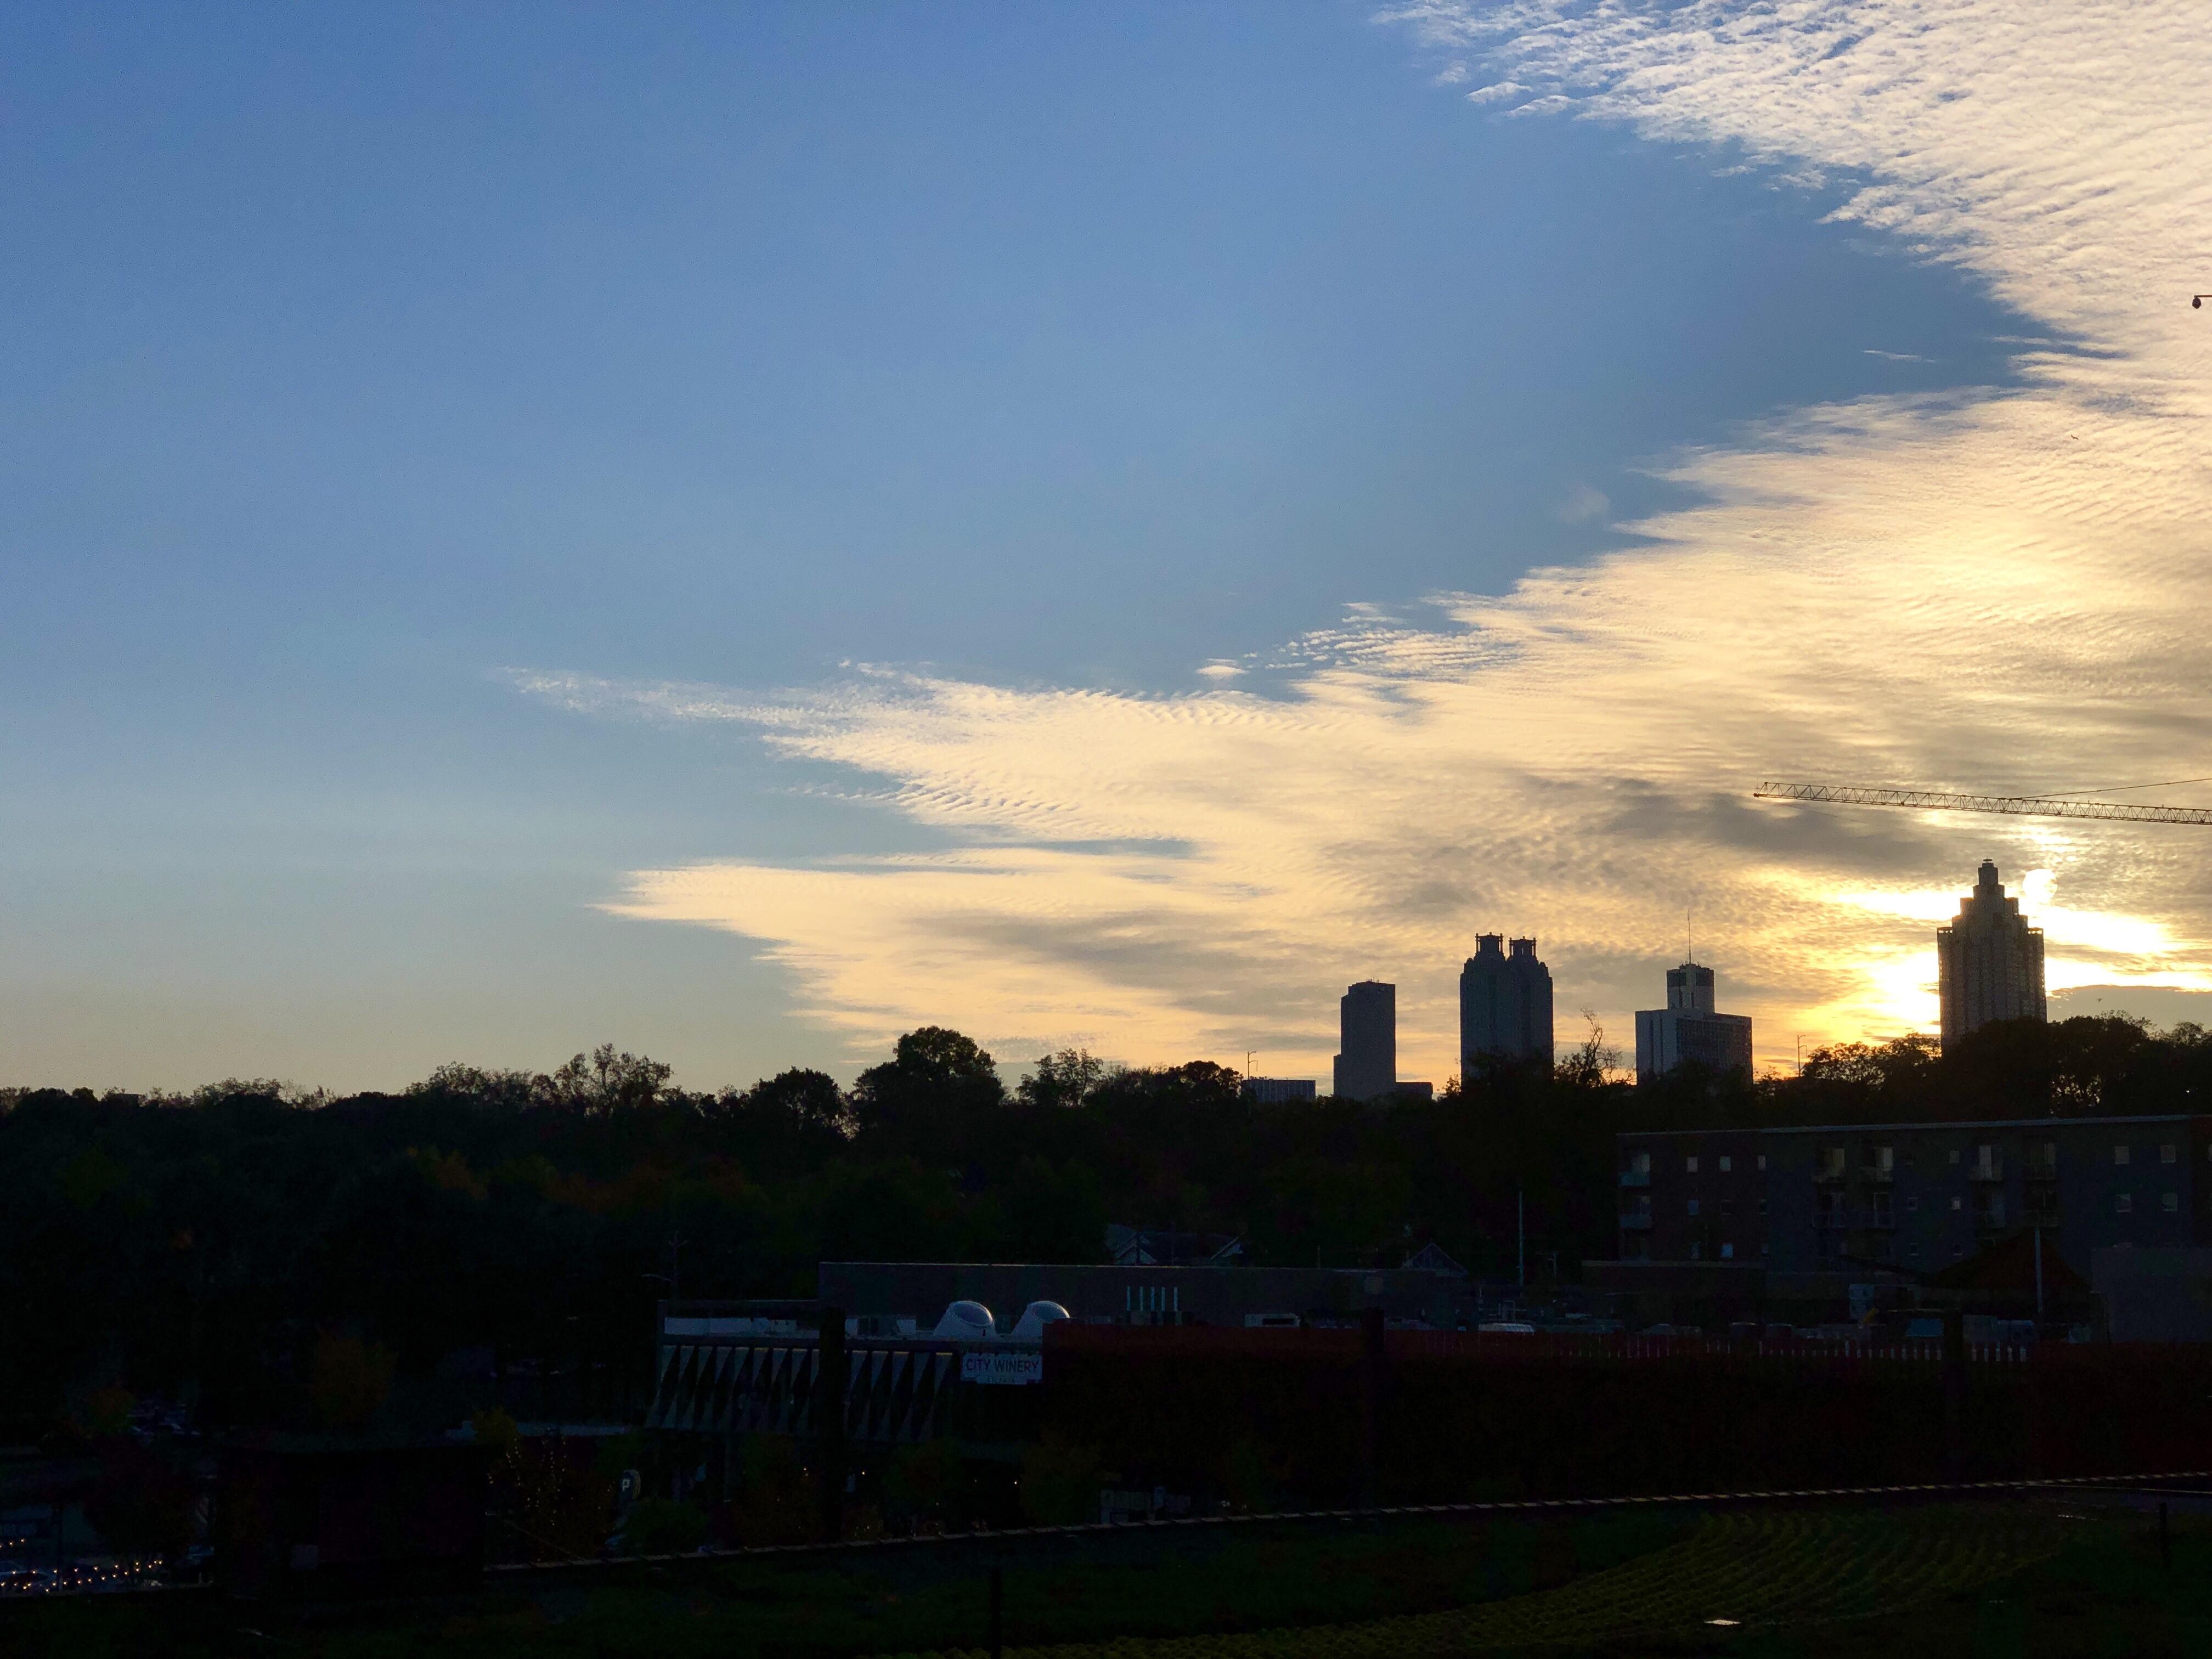 Atlanta skyline from the Beltline